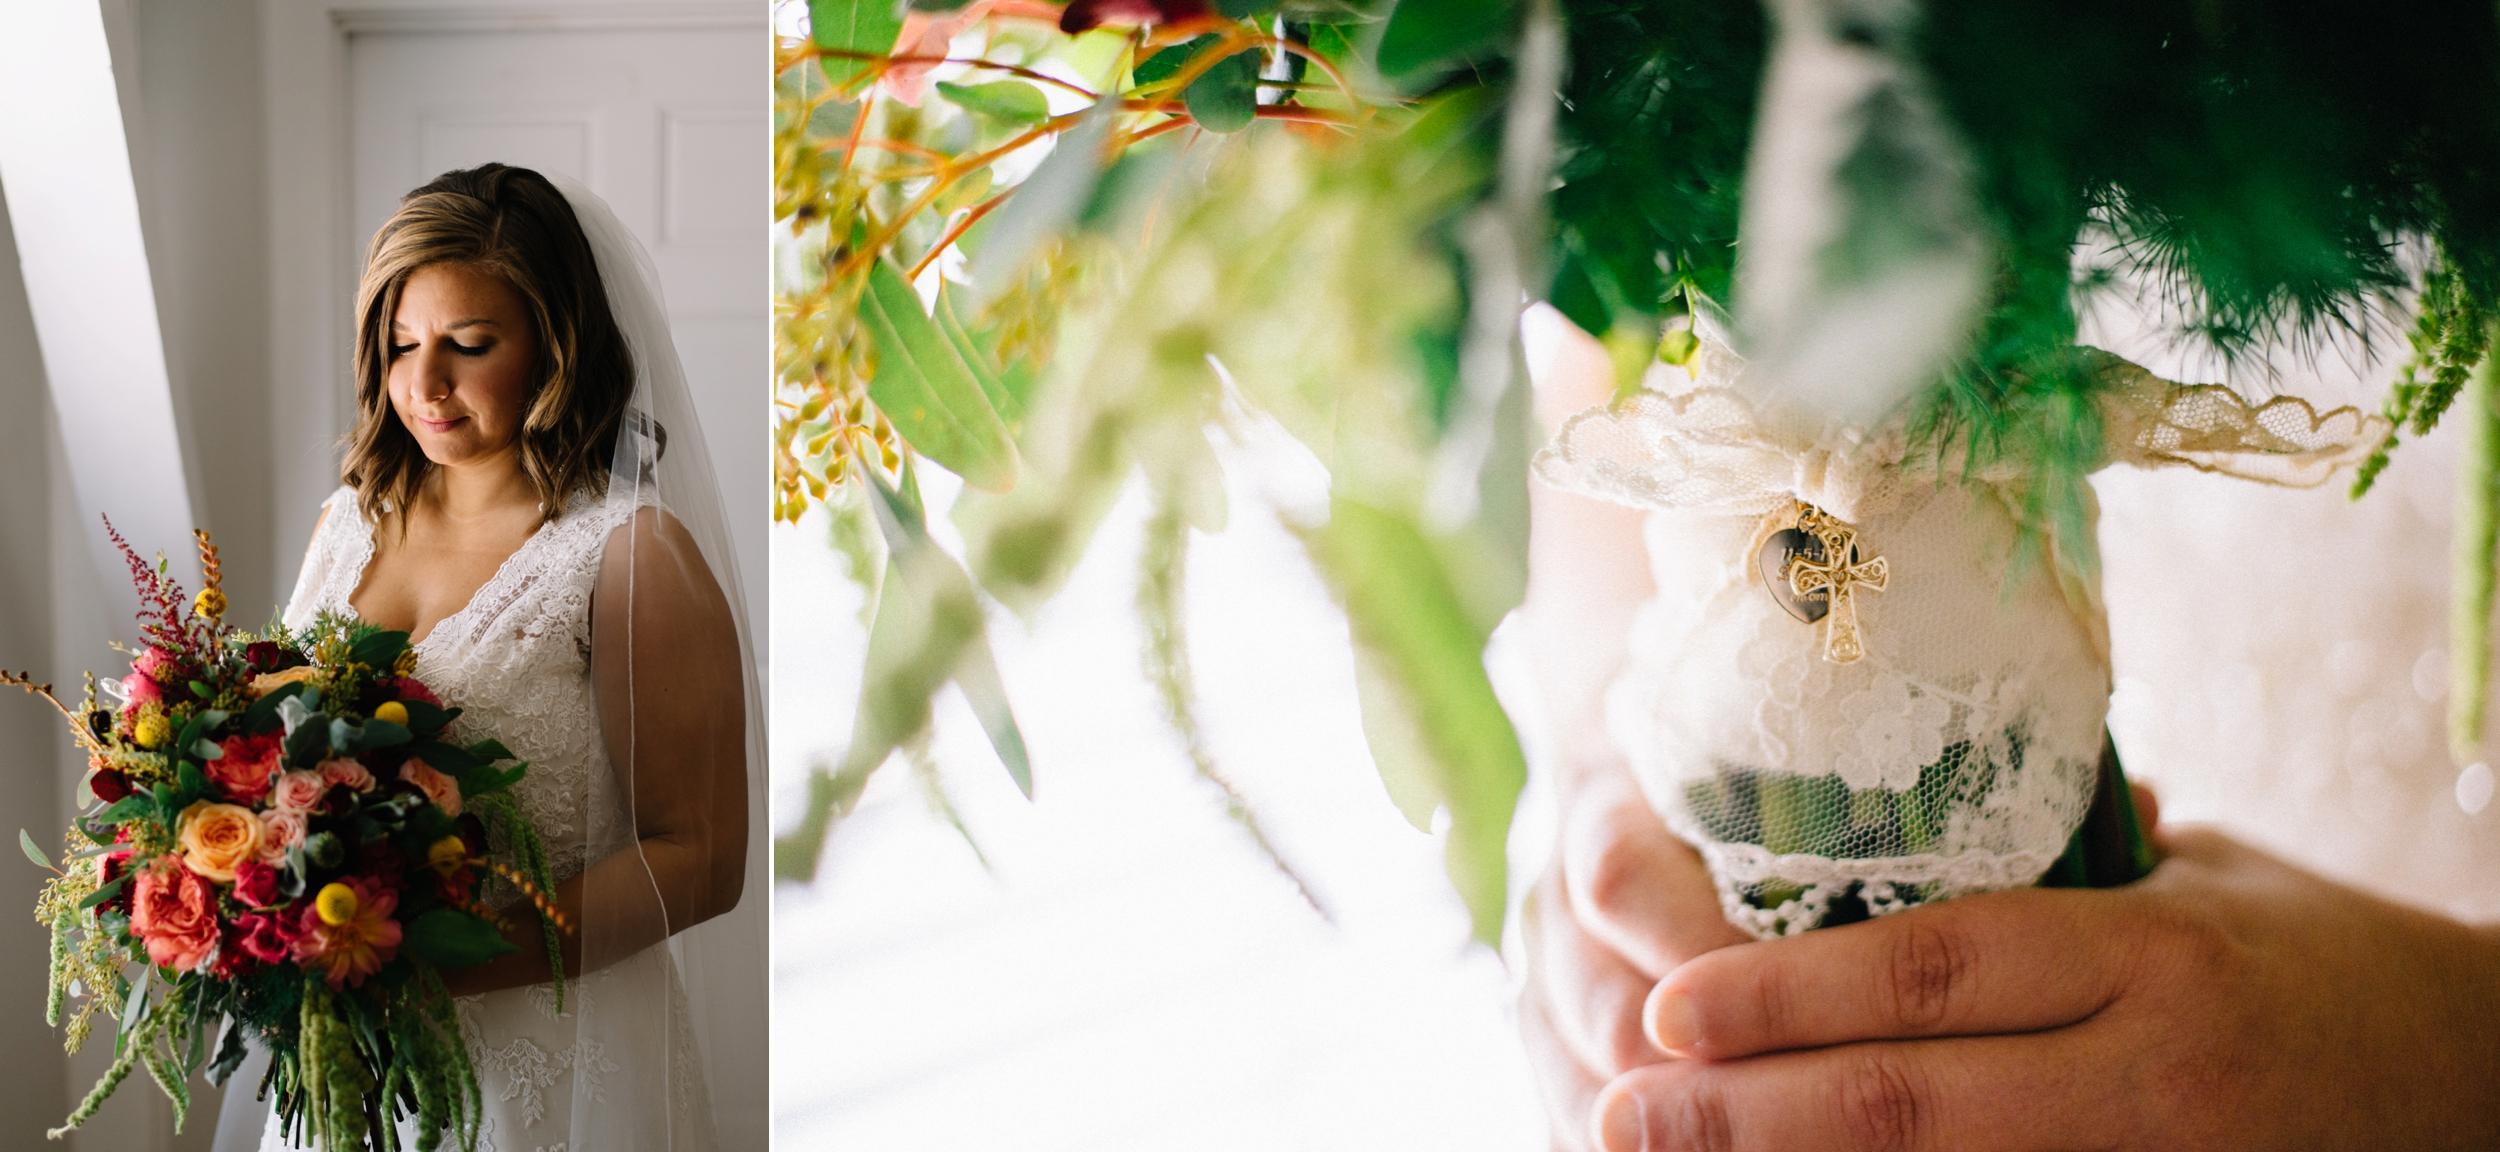 Charleston-wedding-photographer-26.jpg